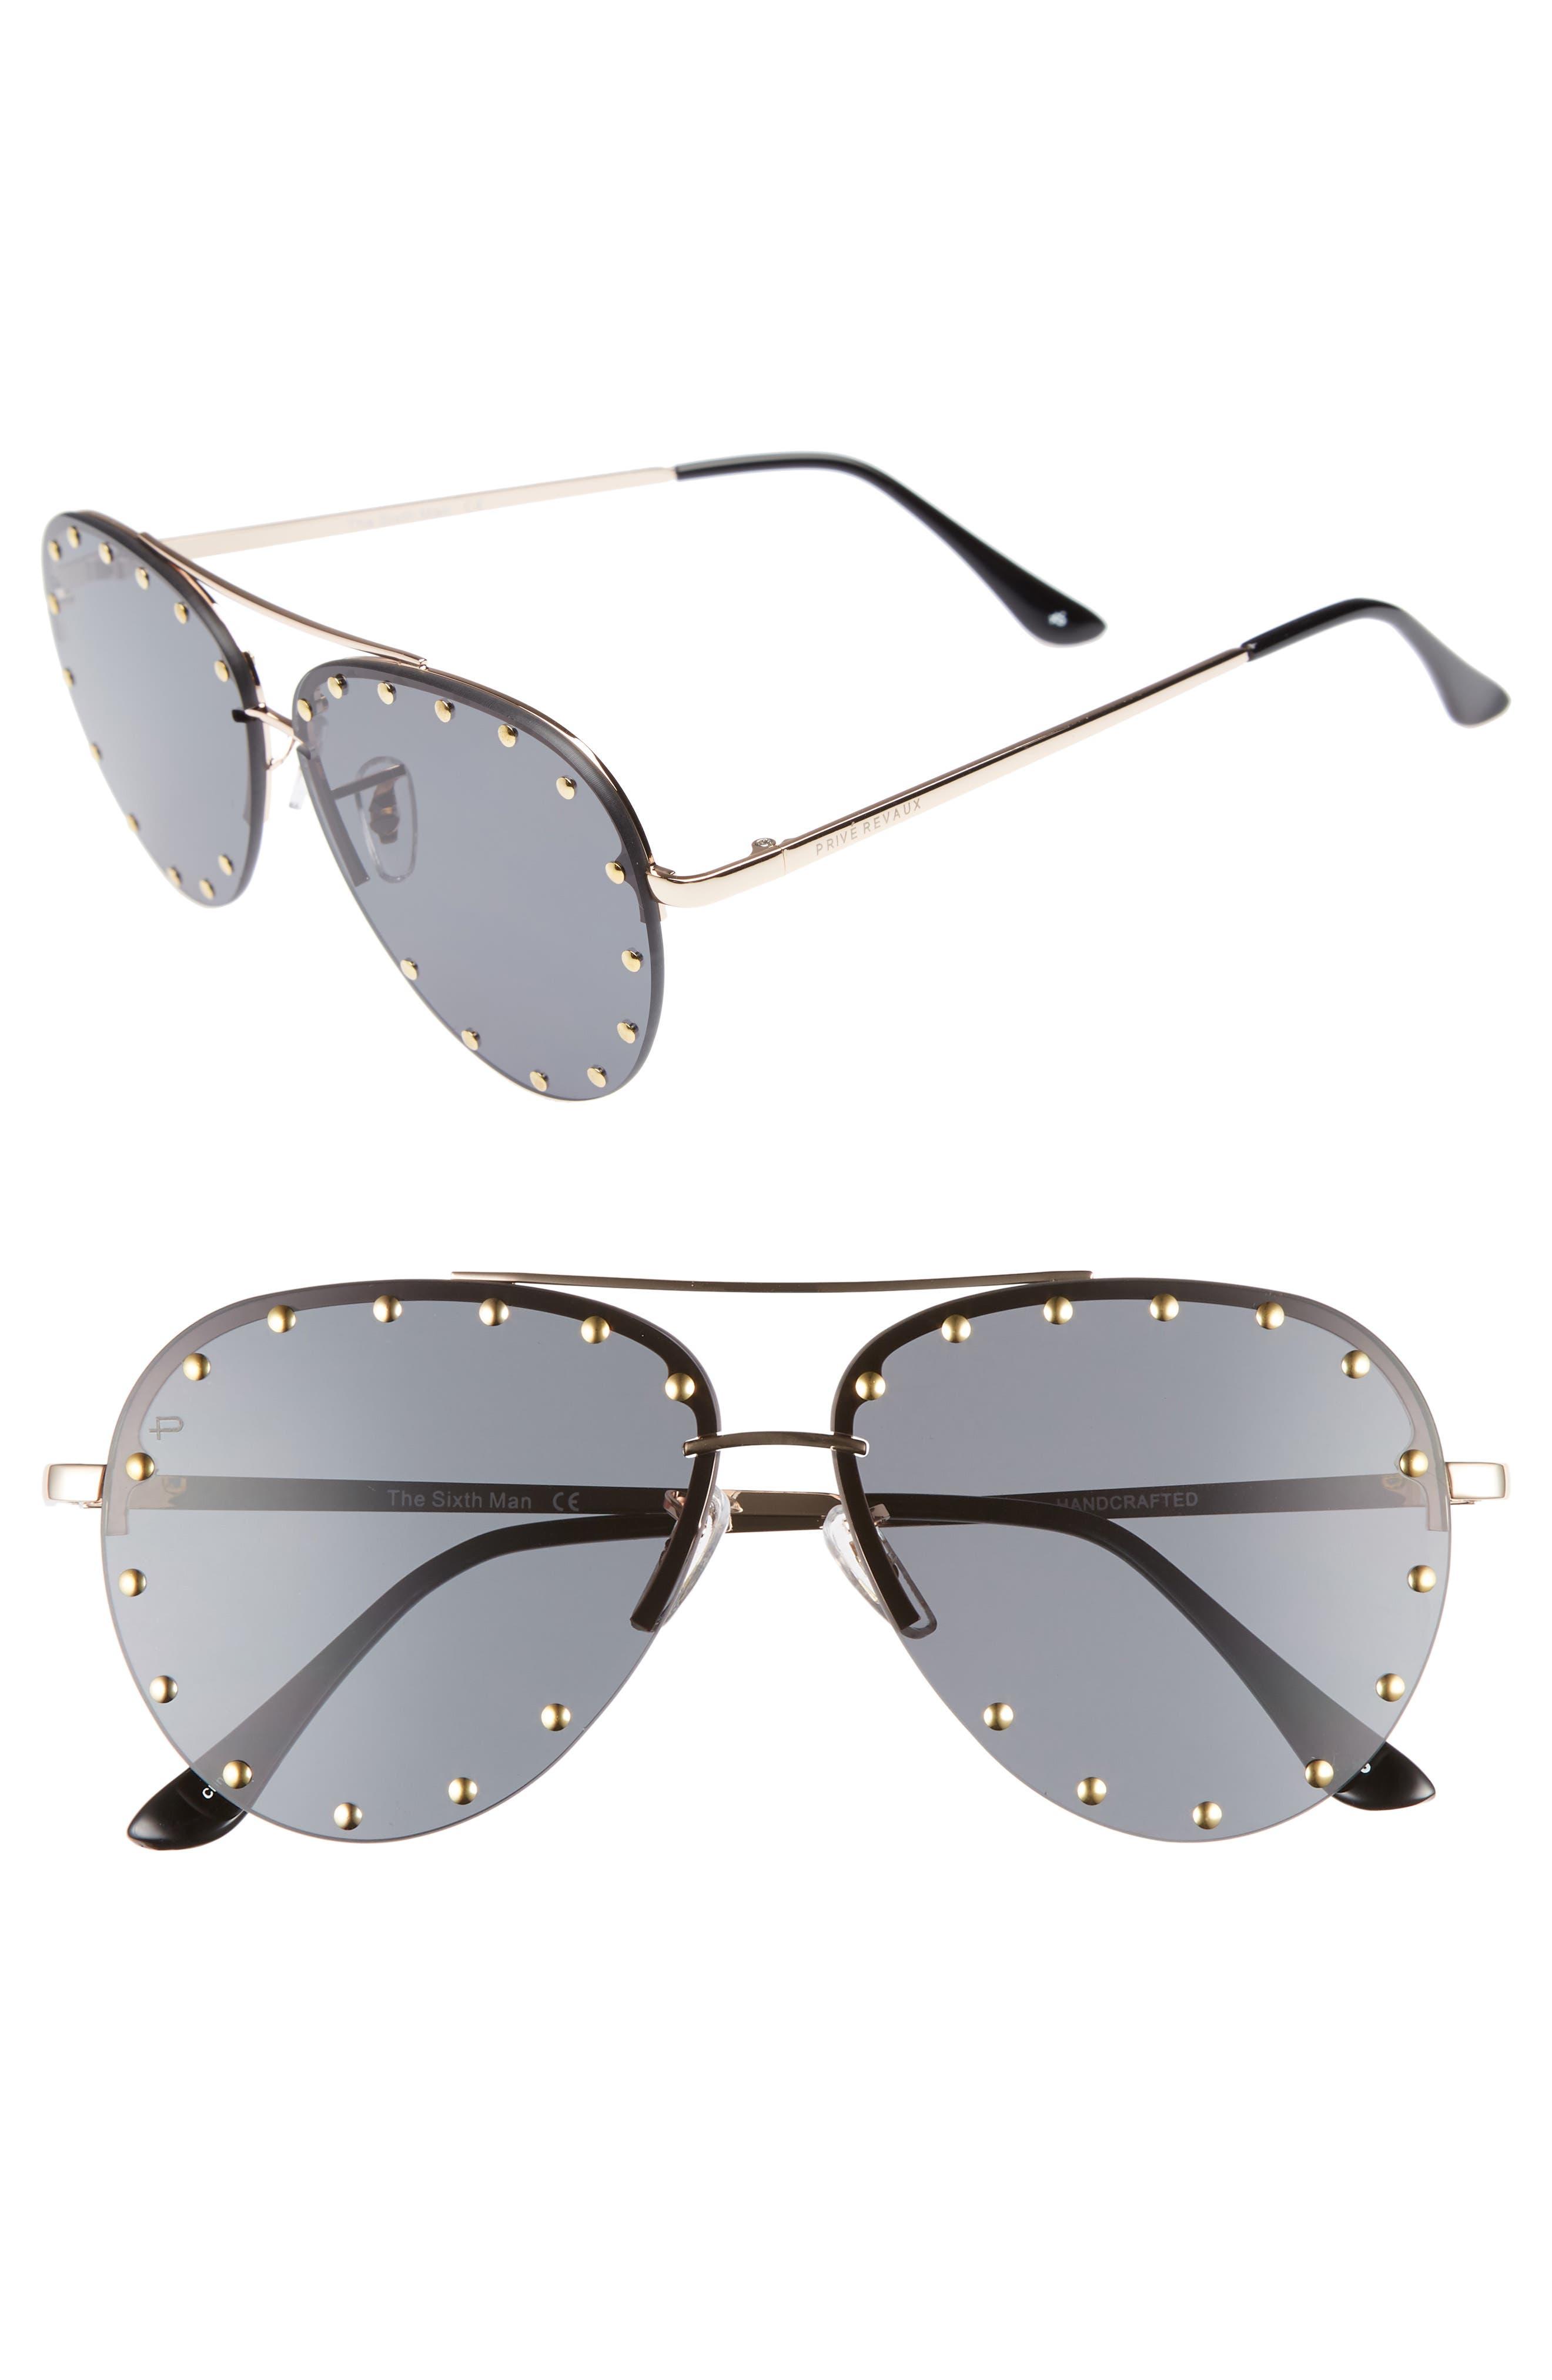 Privé Revaux The Sixth Man 60mm Studded Aviator Sunglasses,                         Main,                         color, 001